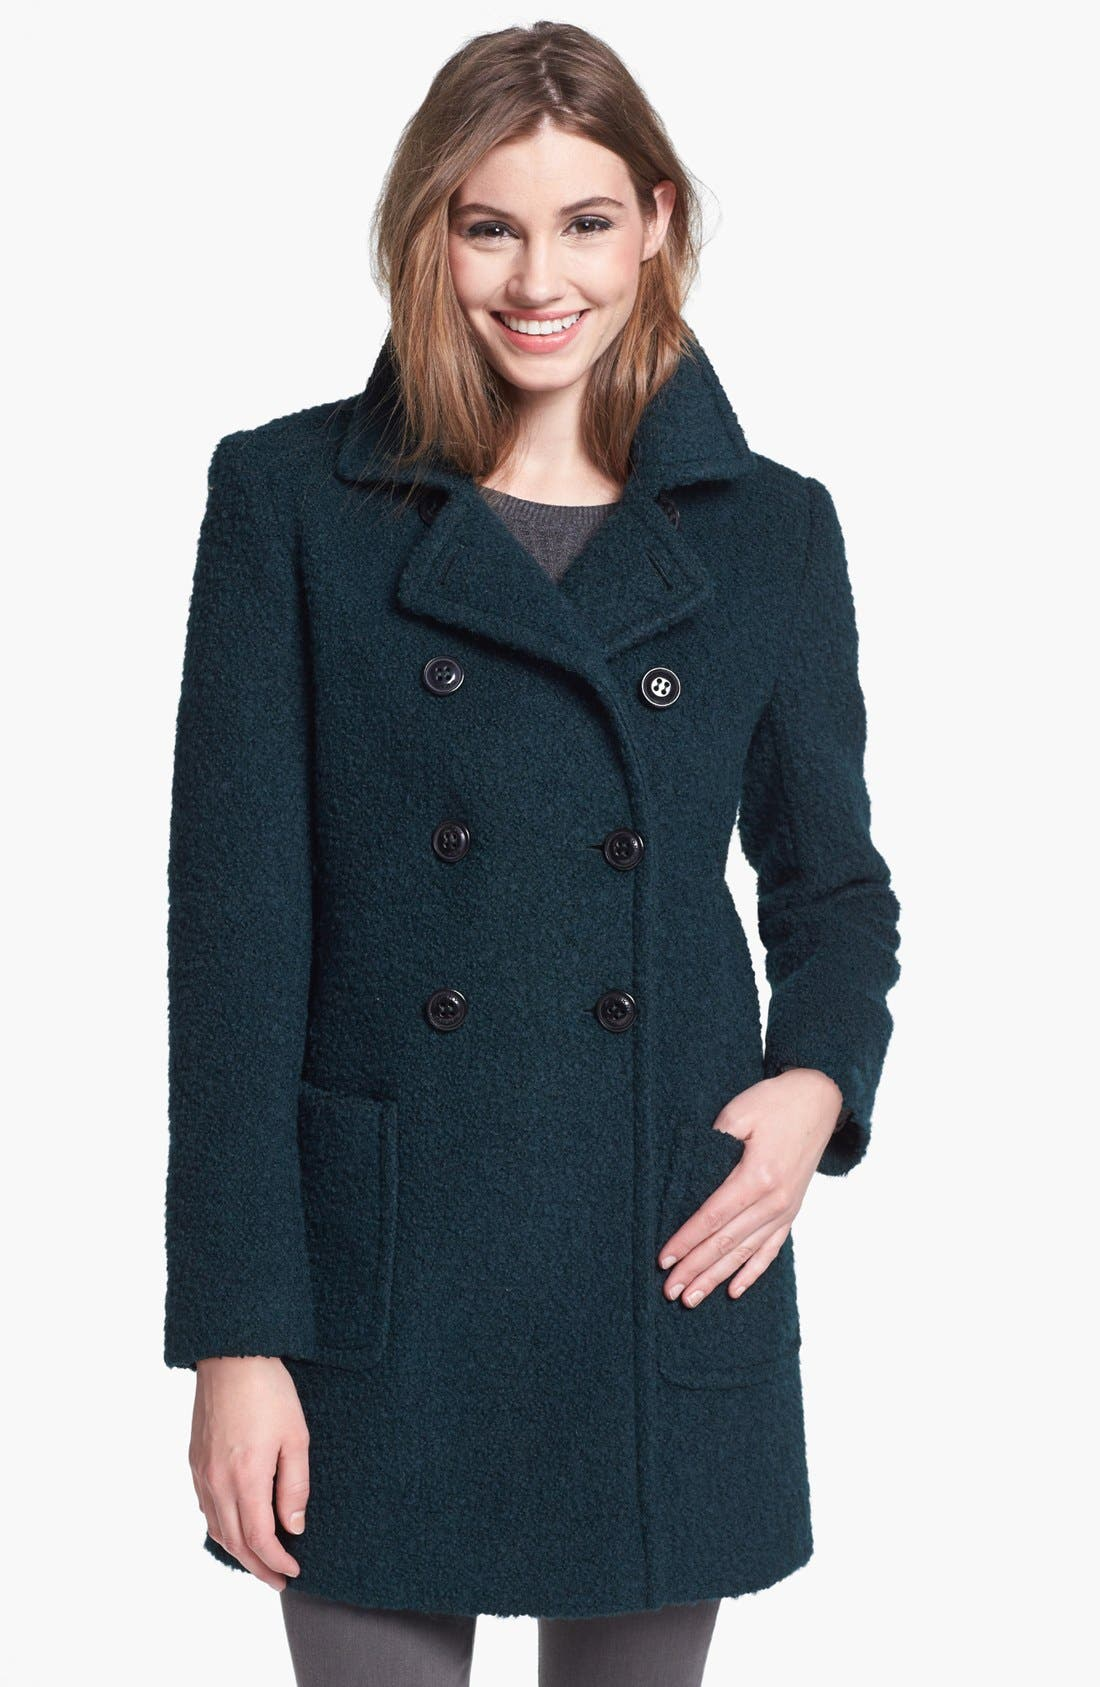 Alternate Image 1 Selected - DKNY Double Breasted Bouclé Coat (Regular & Petite)